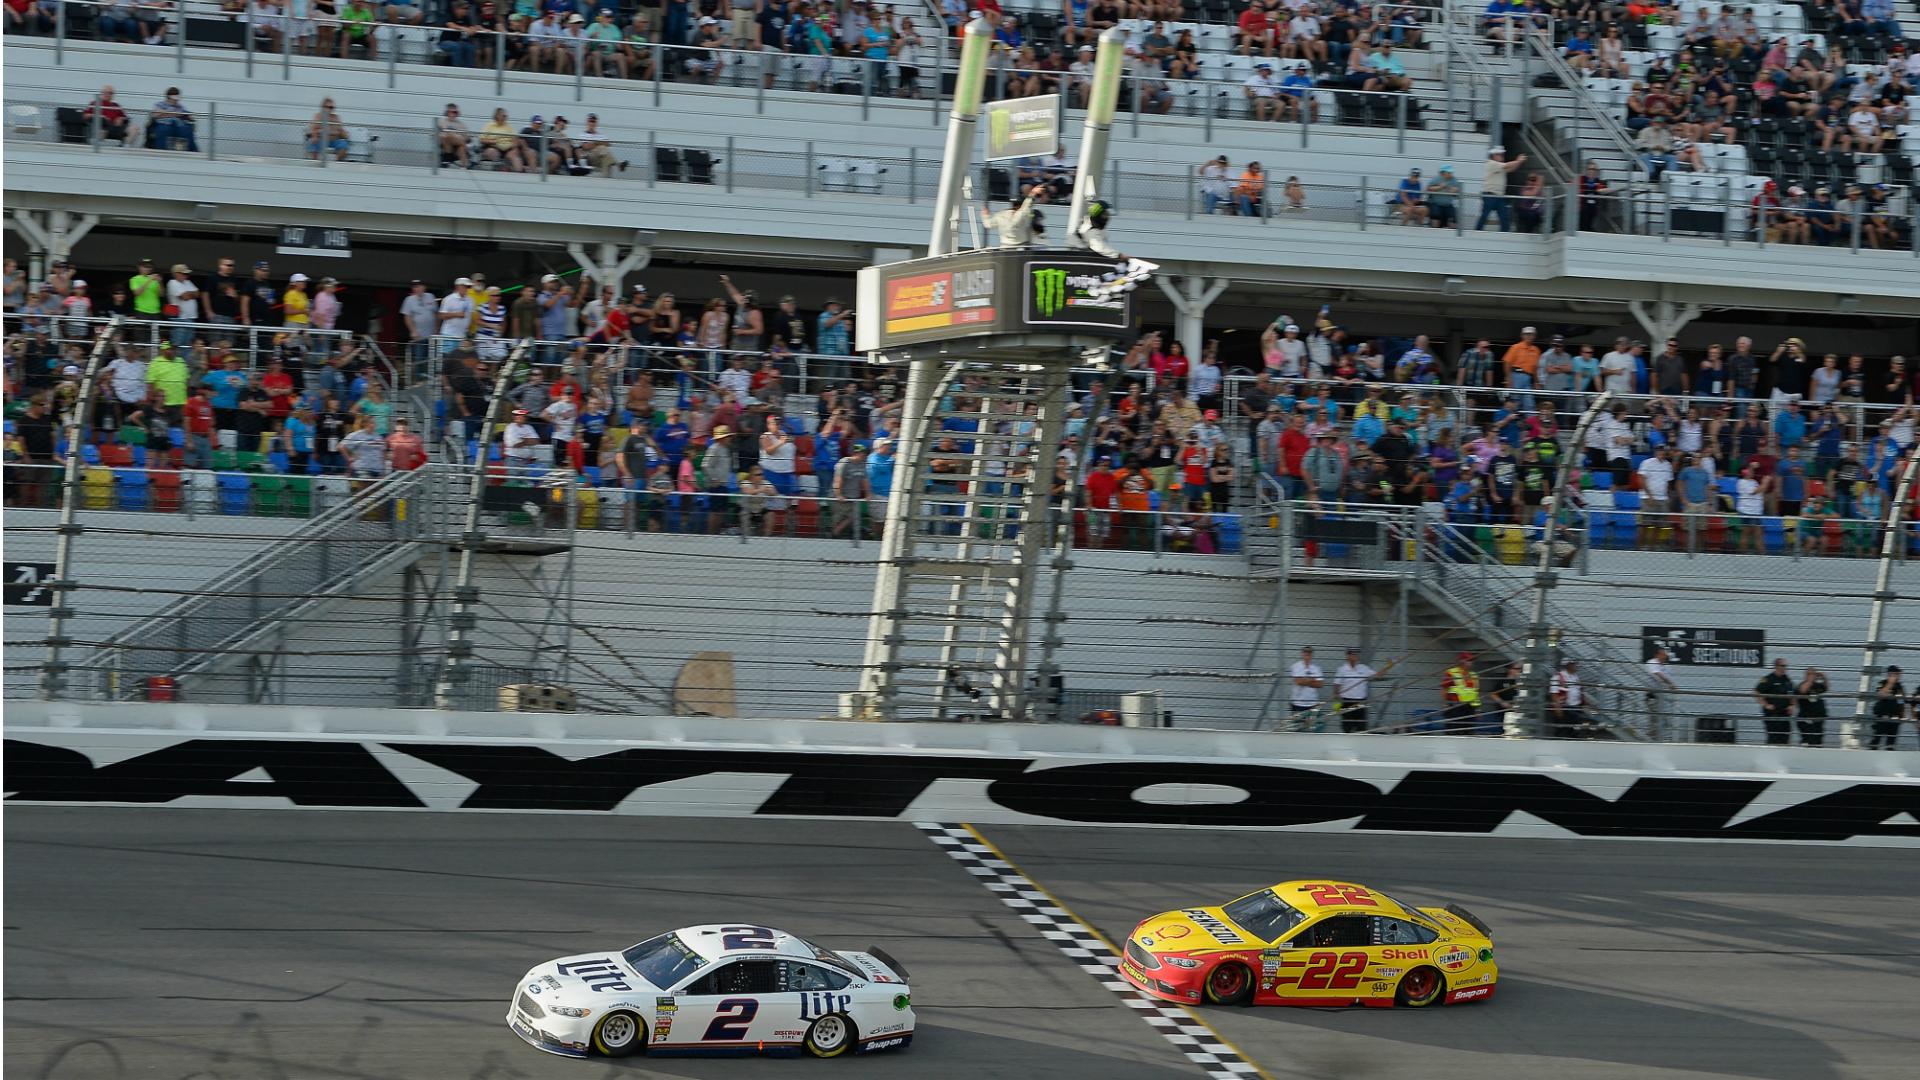 Clash at Daytona 2019: Start time, TV channel, live stream for Daytona 500 exhibition race